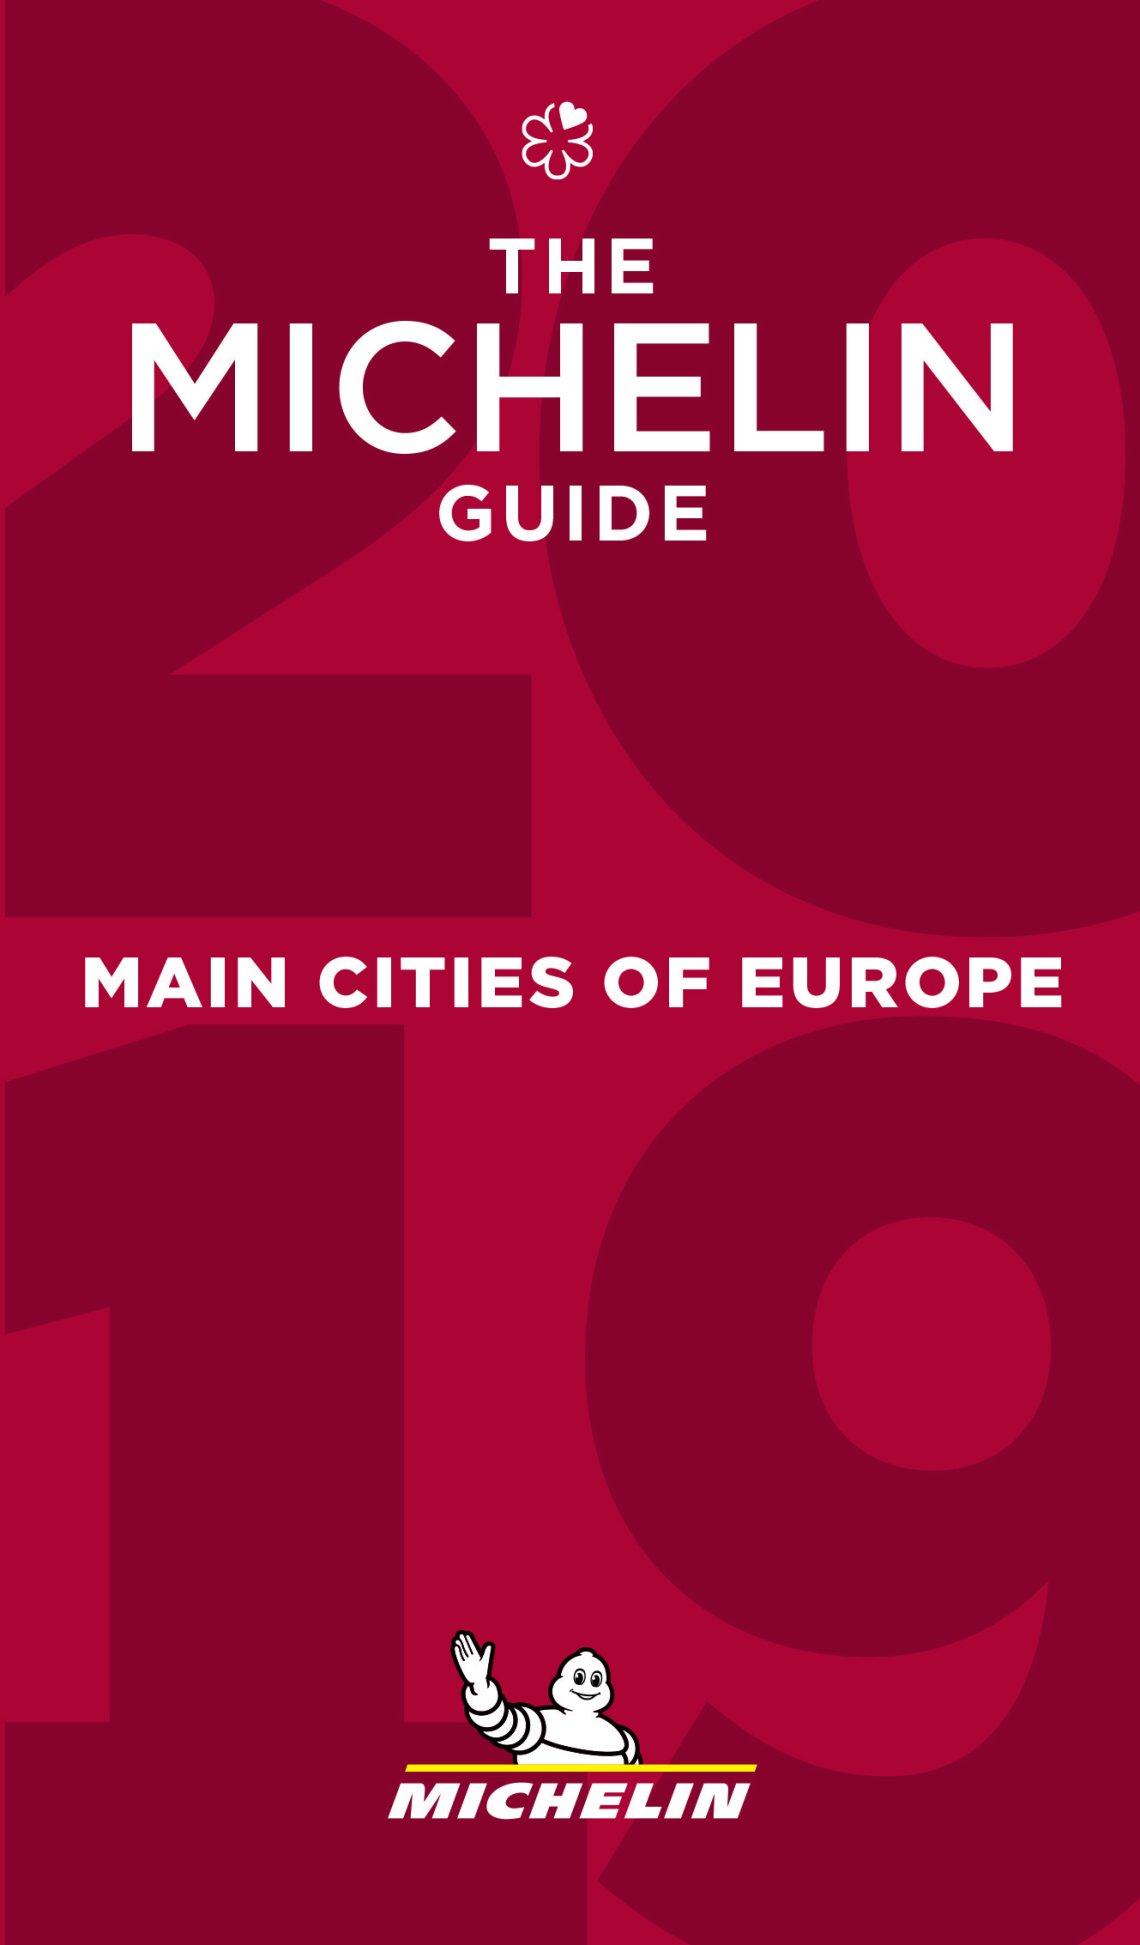 Main Cities of Europe 2019: Αυτά είναι τα καλύτερα εστιατόρια για τη Michelin - itravelling.gr